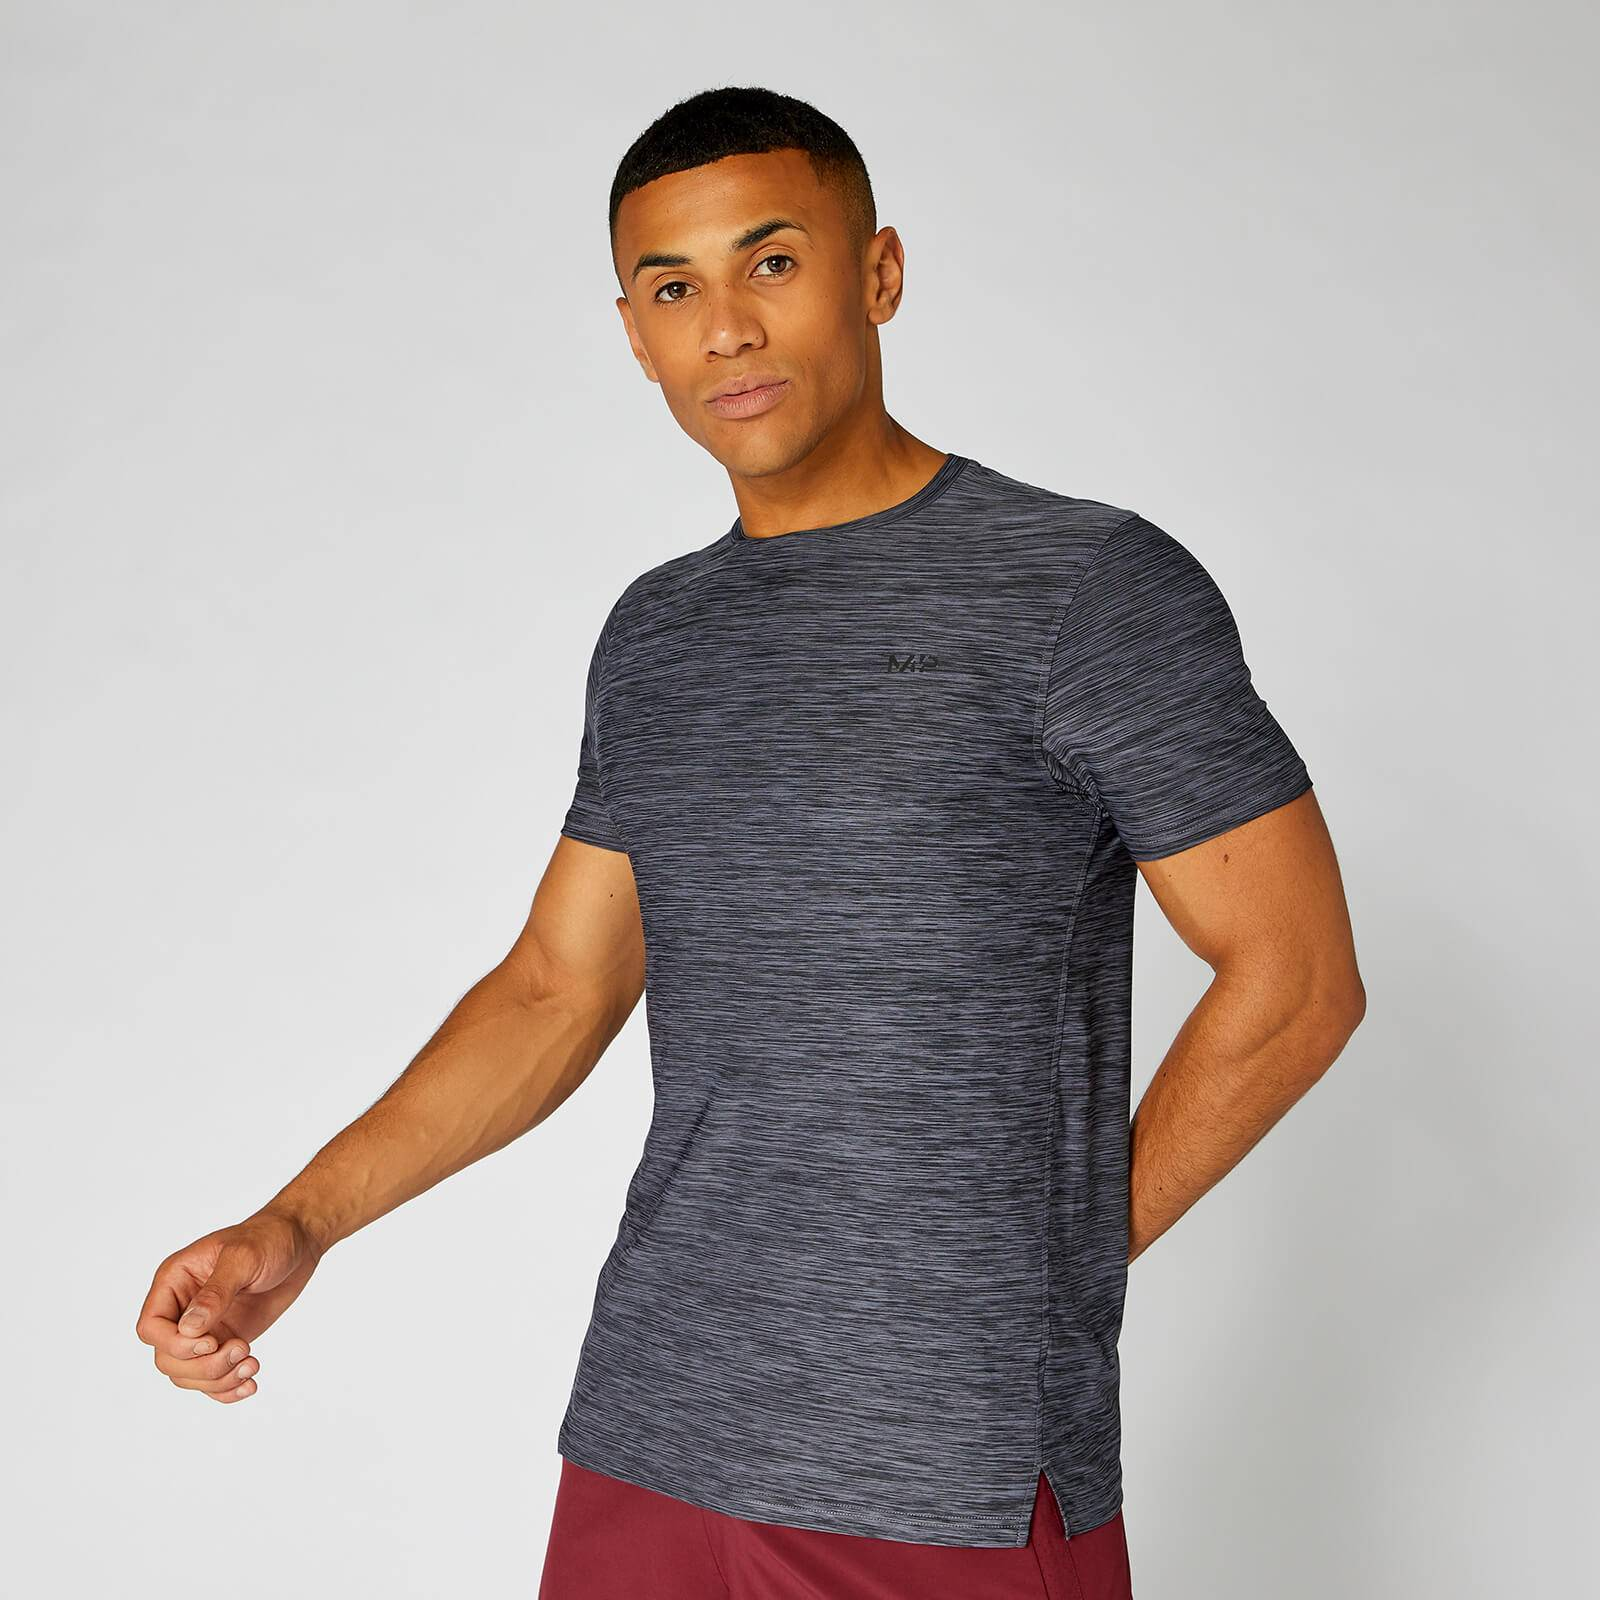 Myprotein Dry-Tech Infinity T-Shirt — Blue Marl - XS